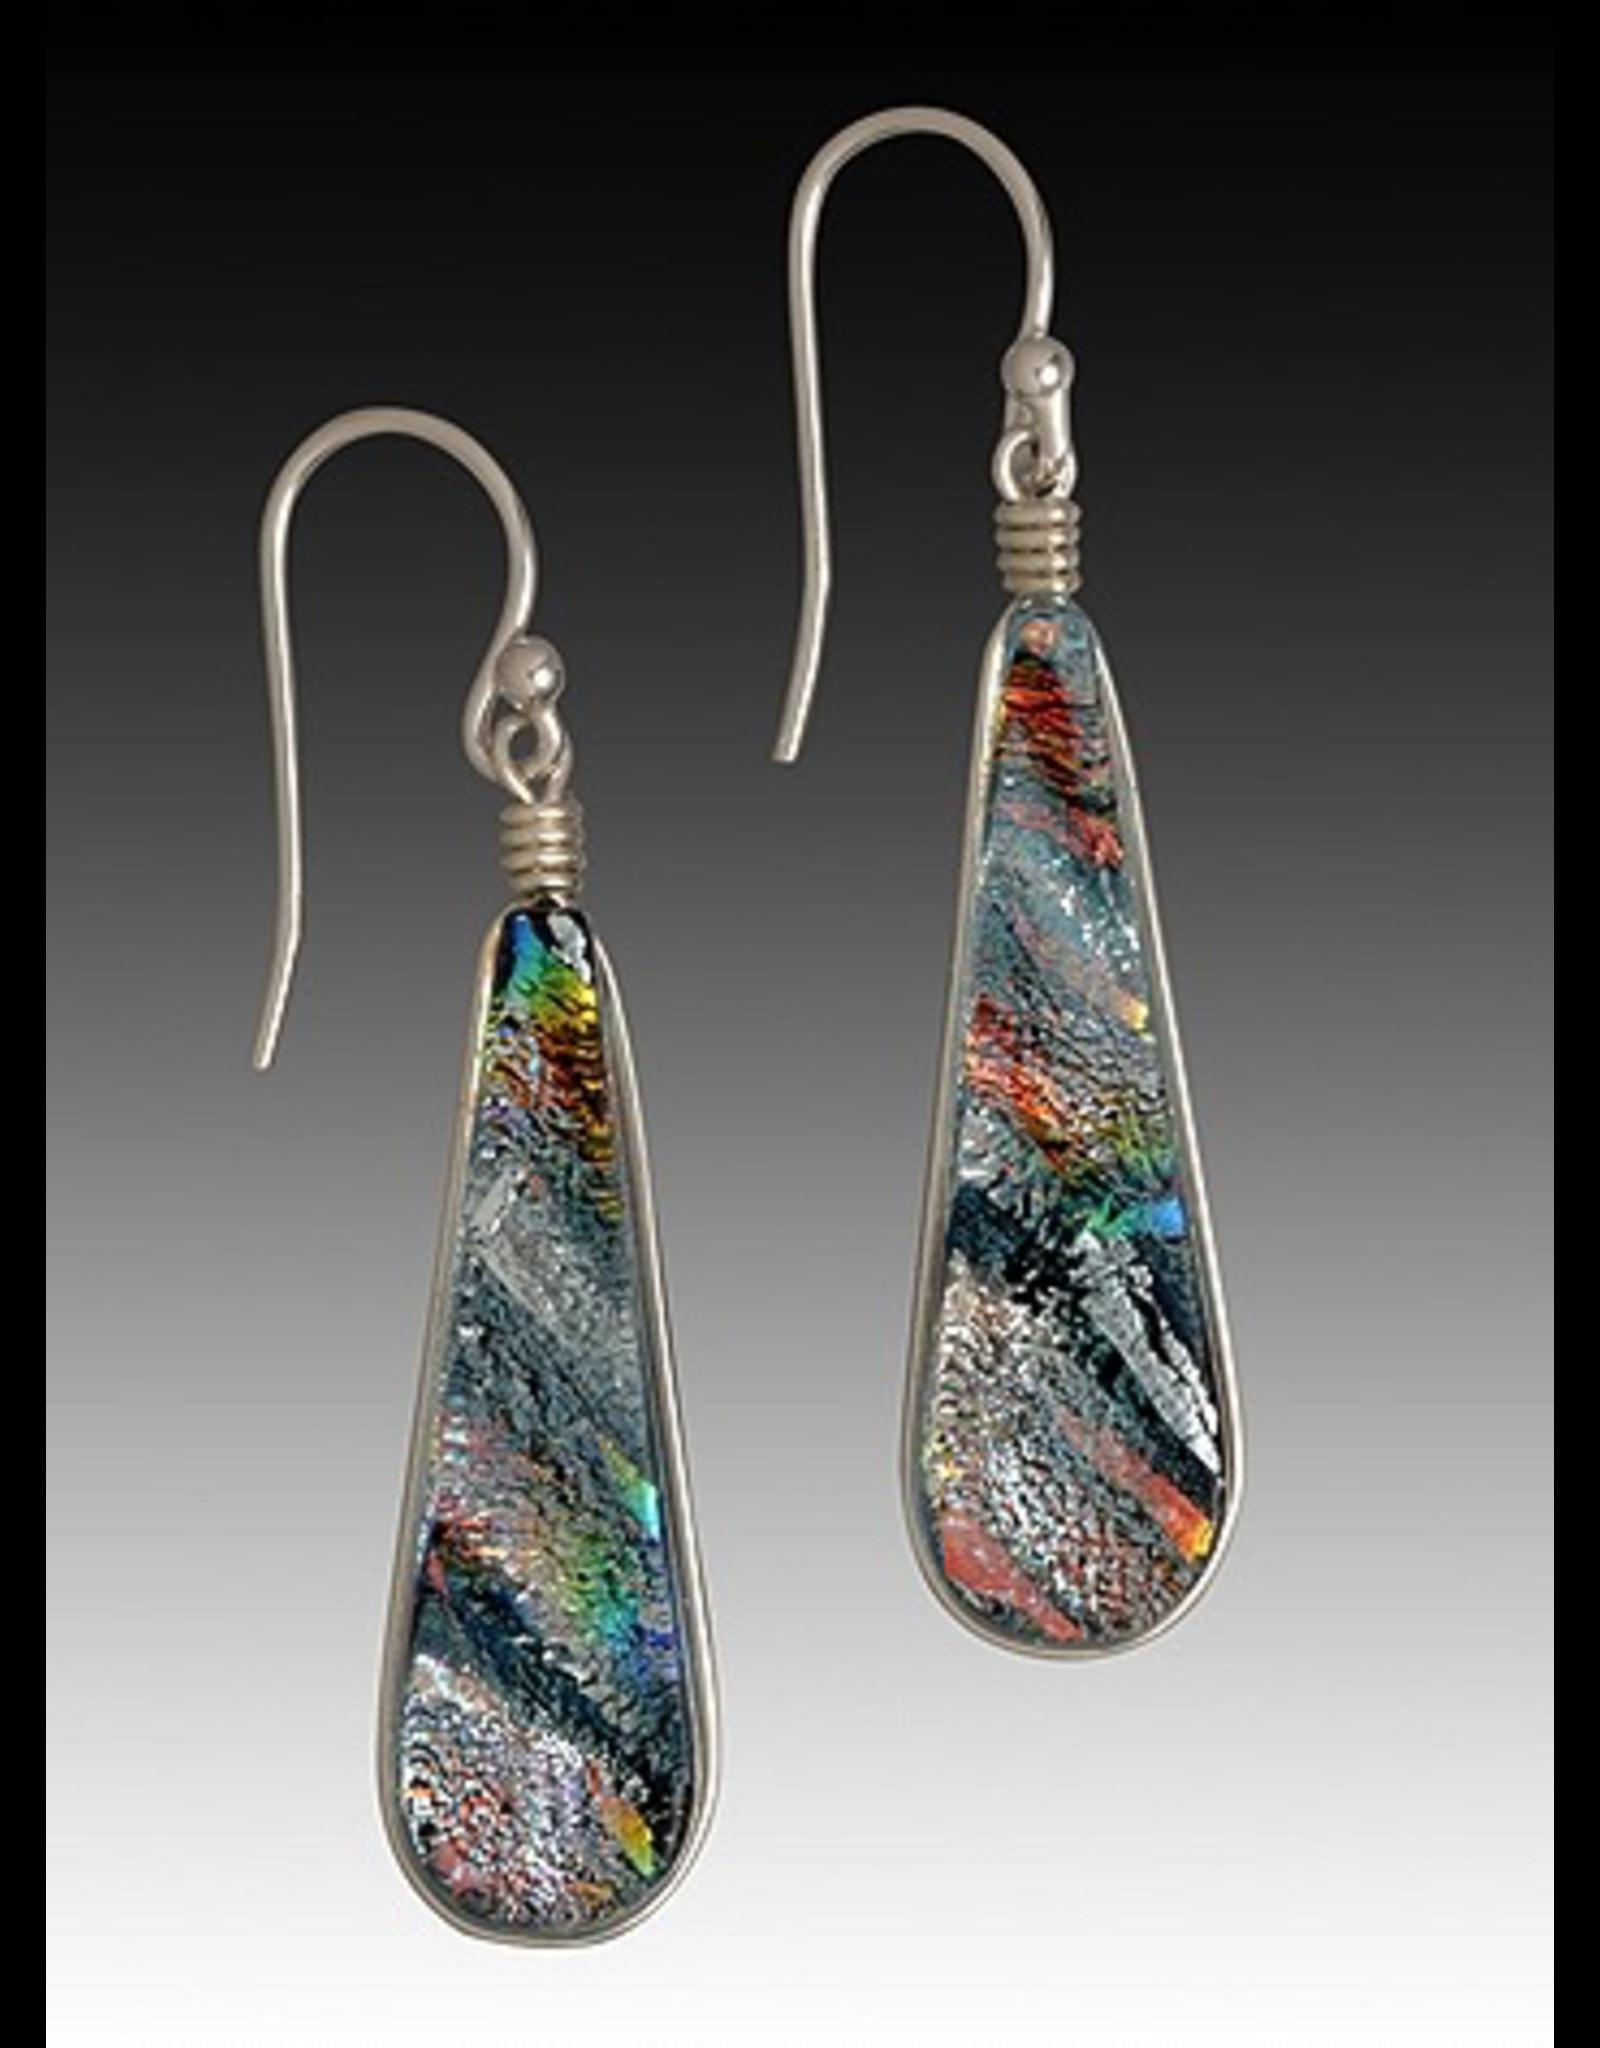 Renaissance Glass TEARDROP EARRINGS (Lg, Dichroic Art Glass, Assorted Colors, #225)